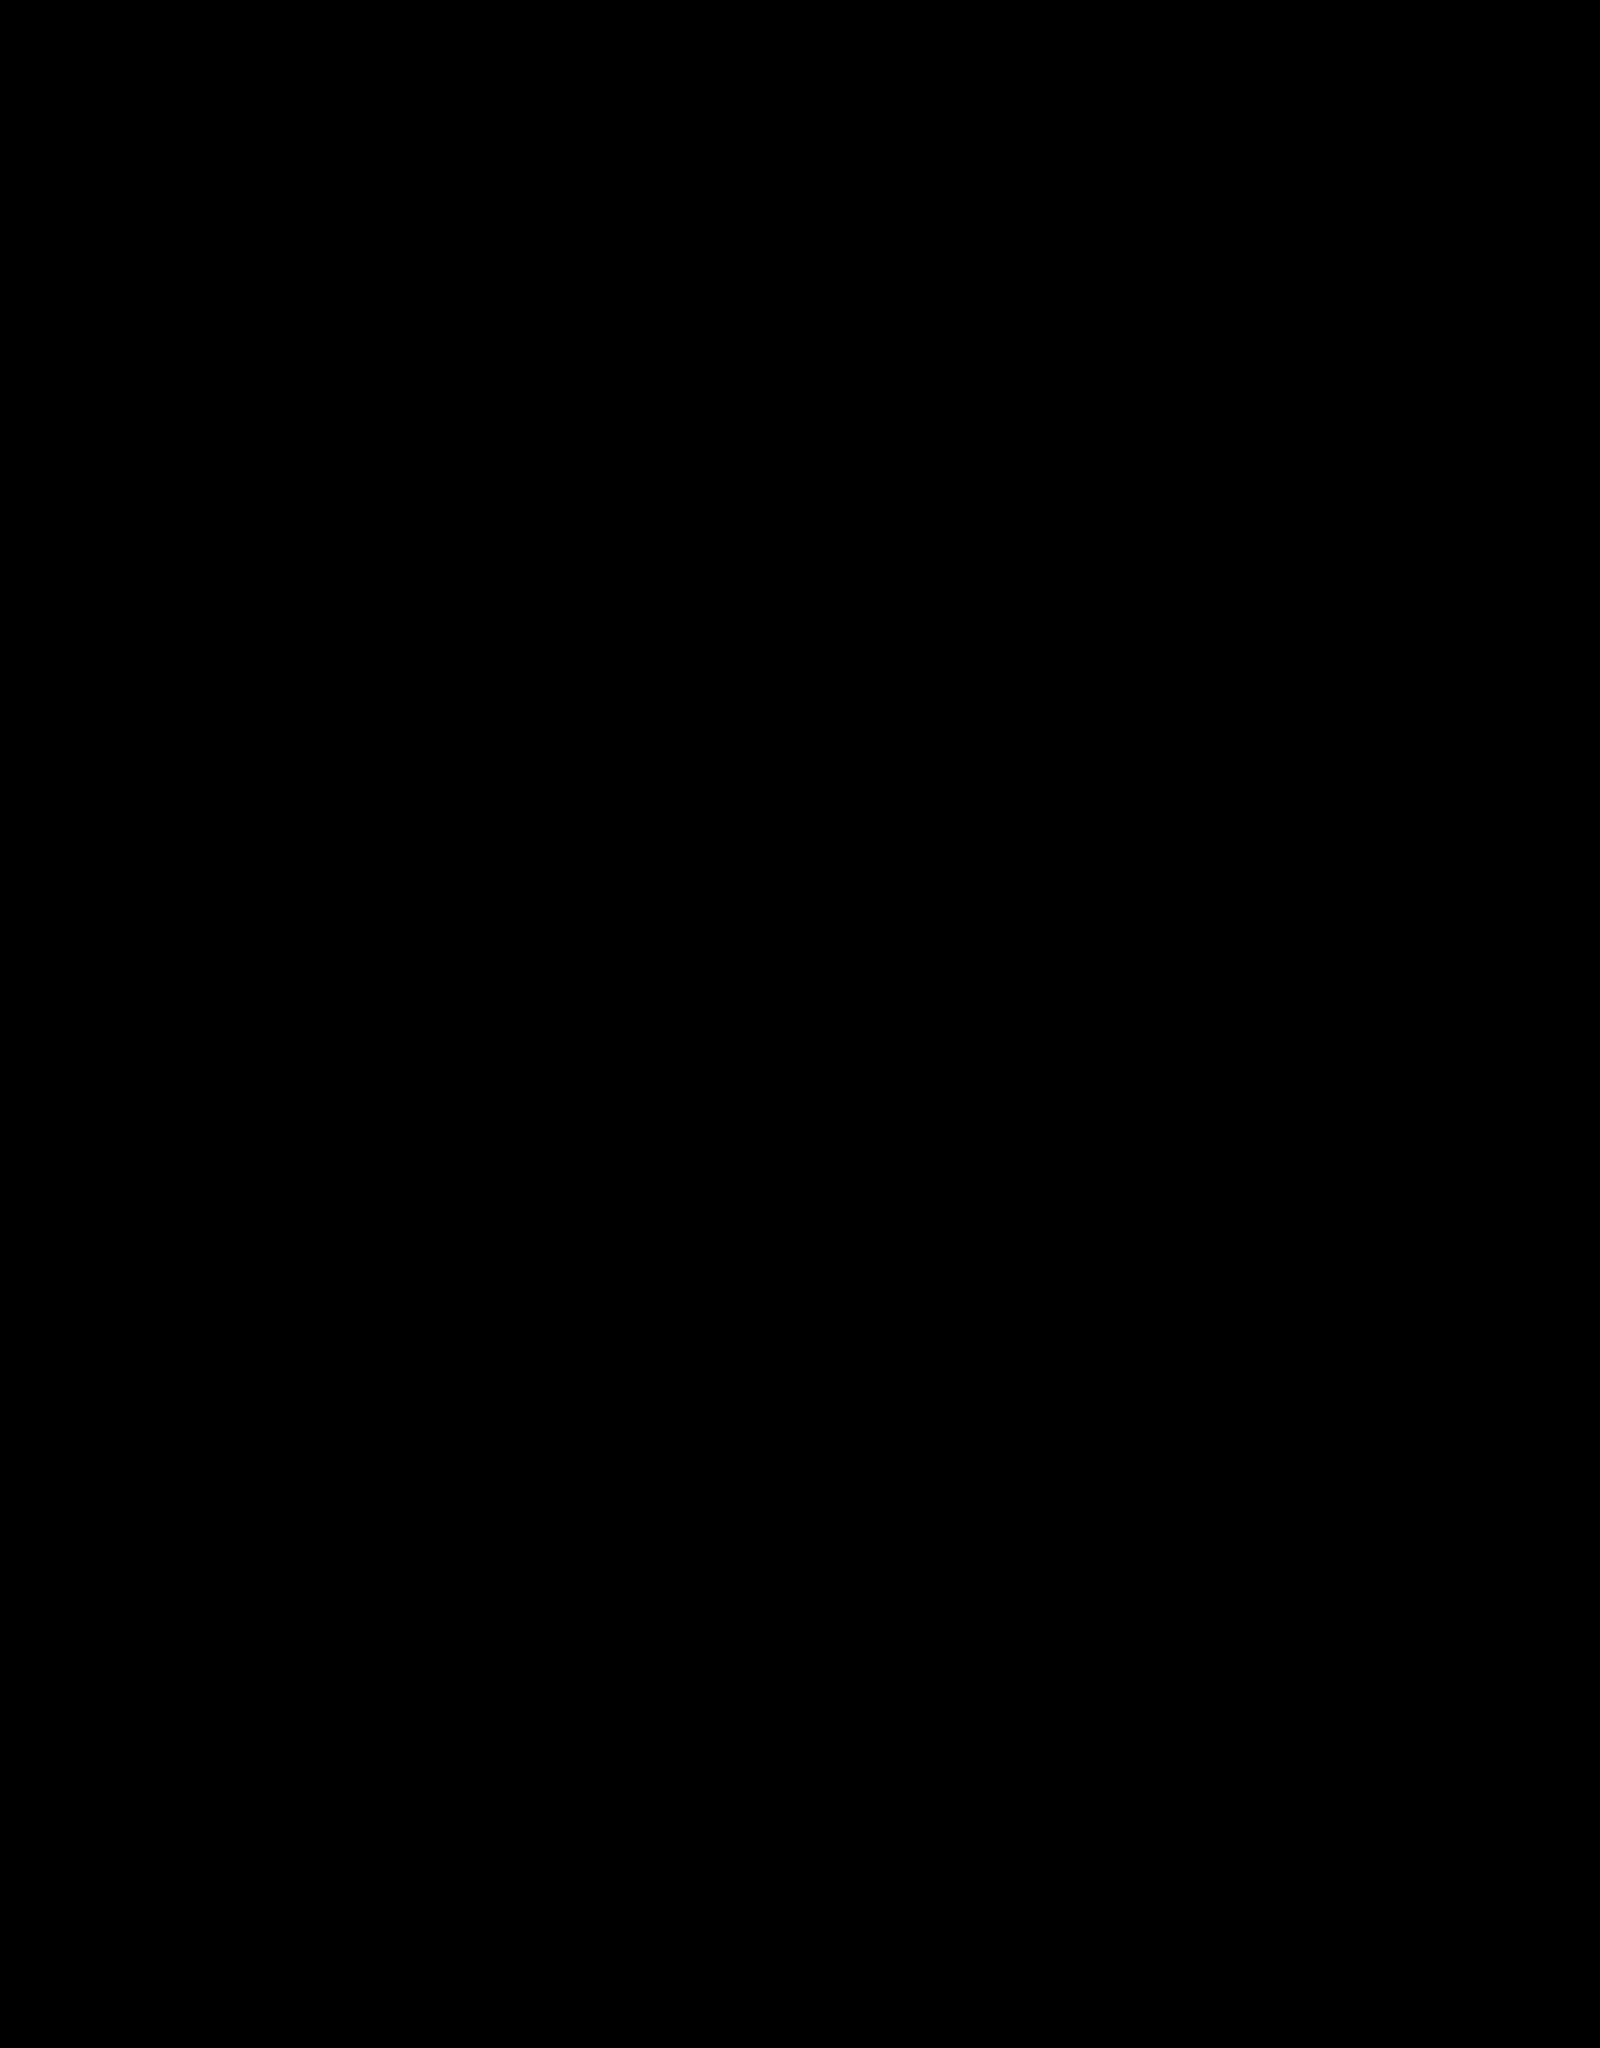 Leuchtturm 1917 Leuchtturm 1917 Master Slim Dot Grid A4+